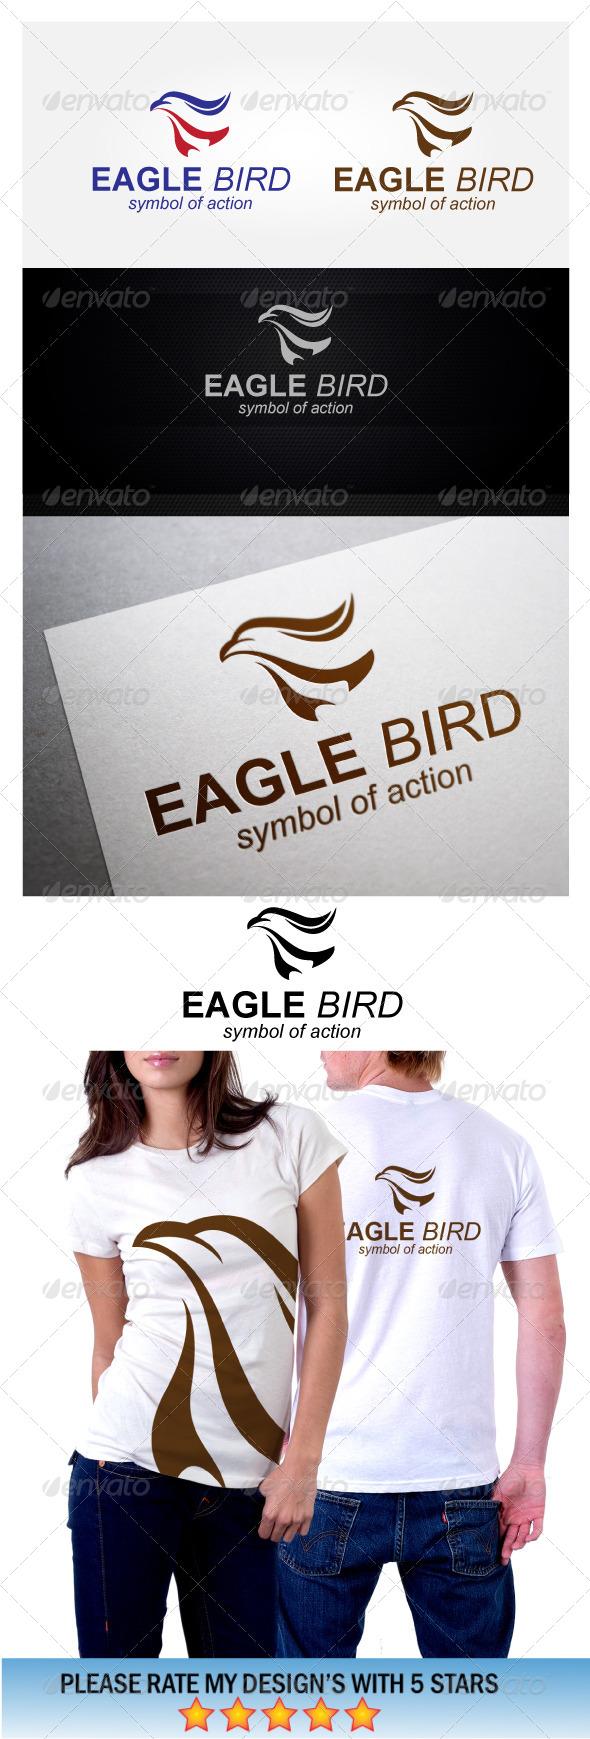 GraphicRiver Eagle Bird Symbol Action 5662168